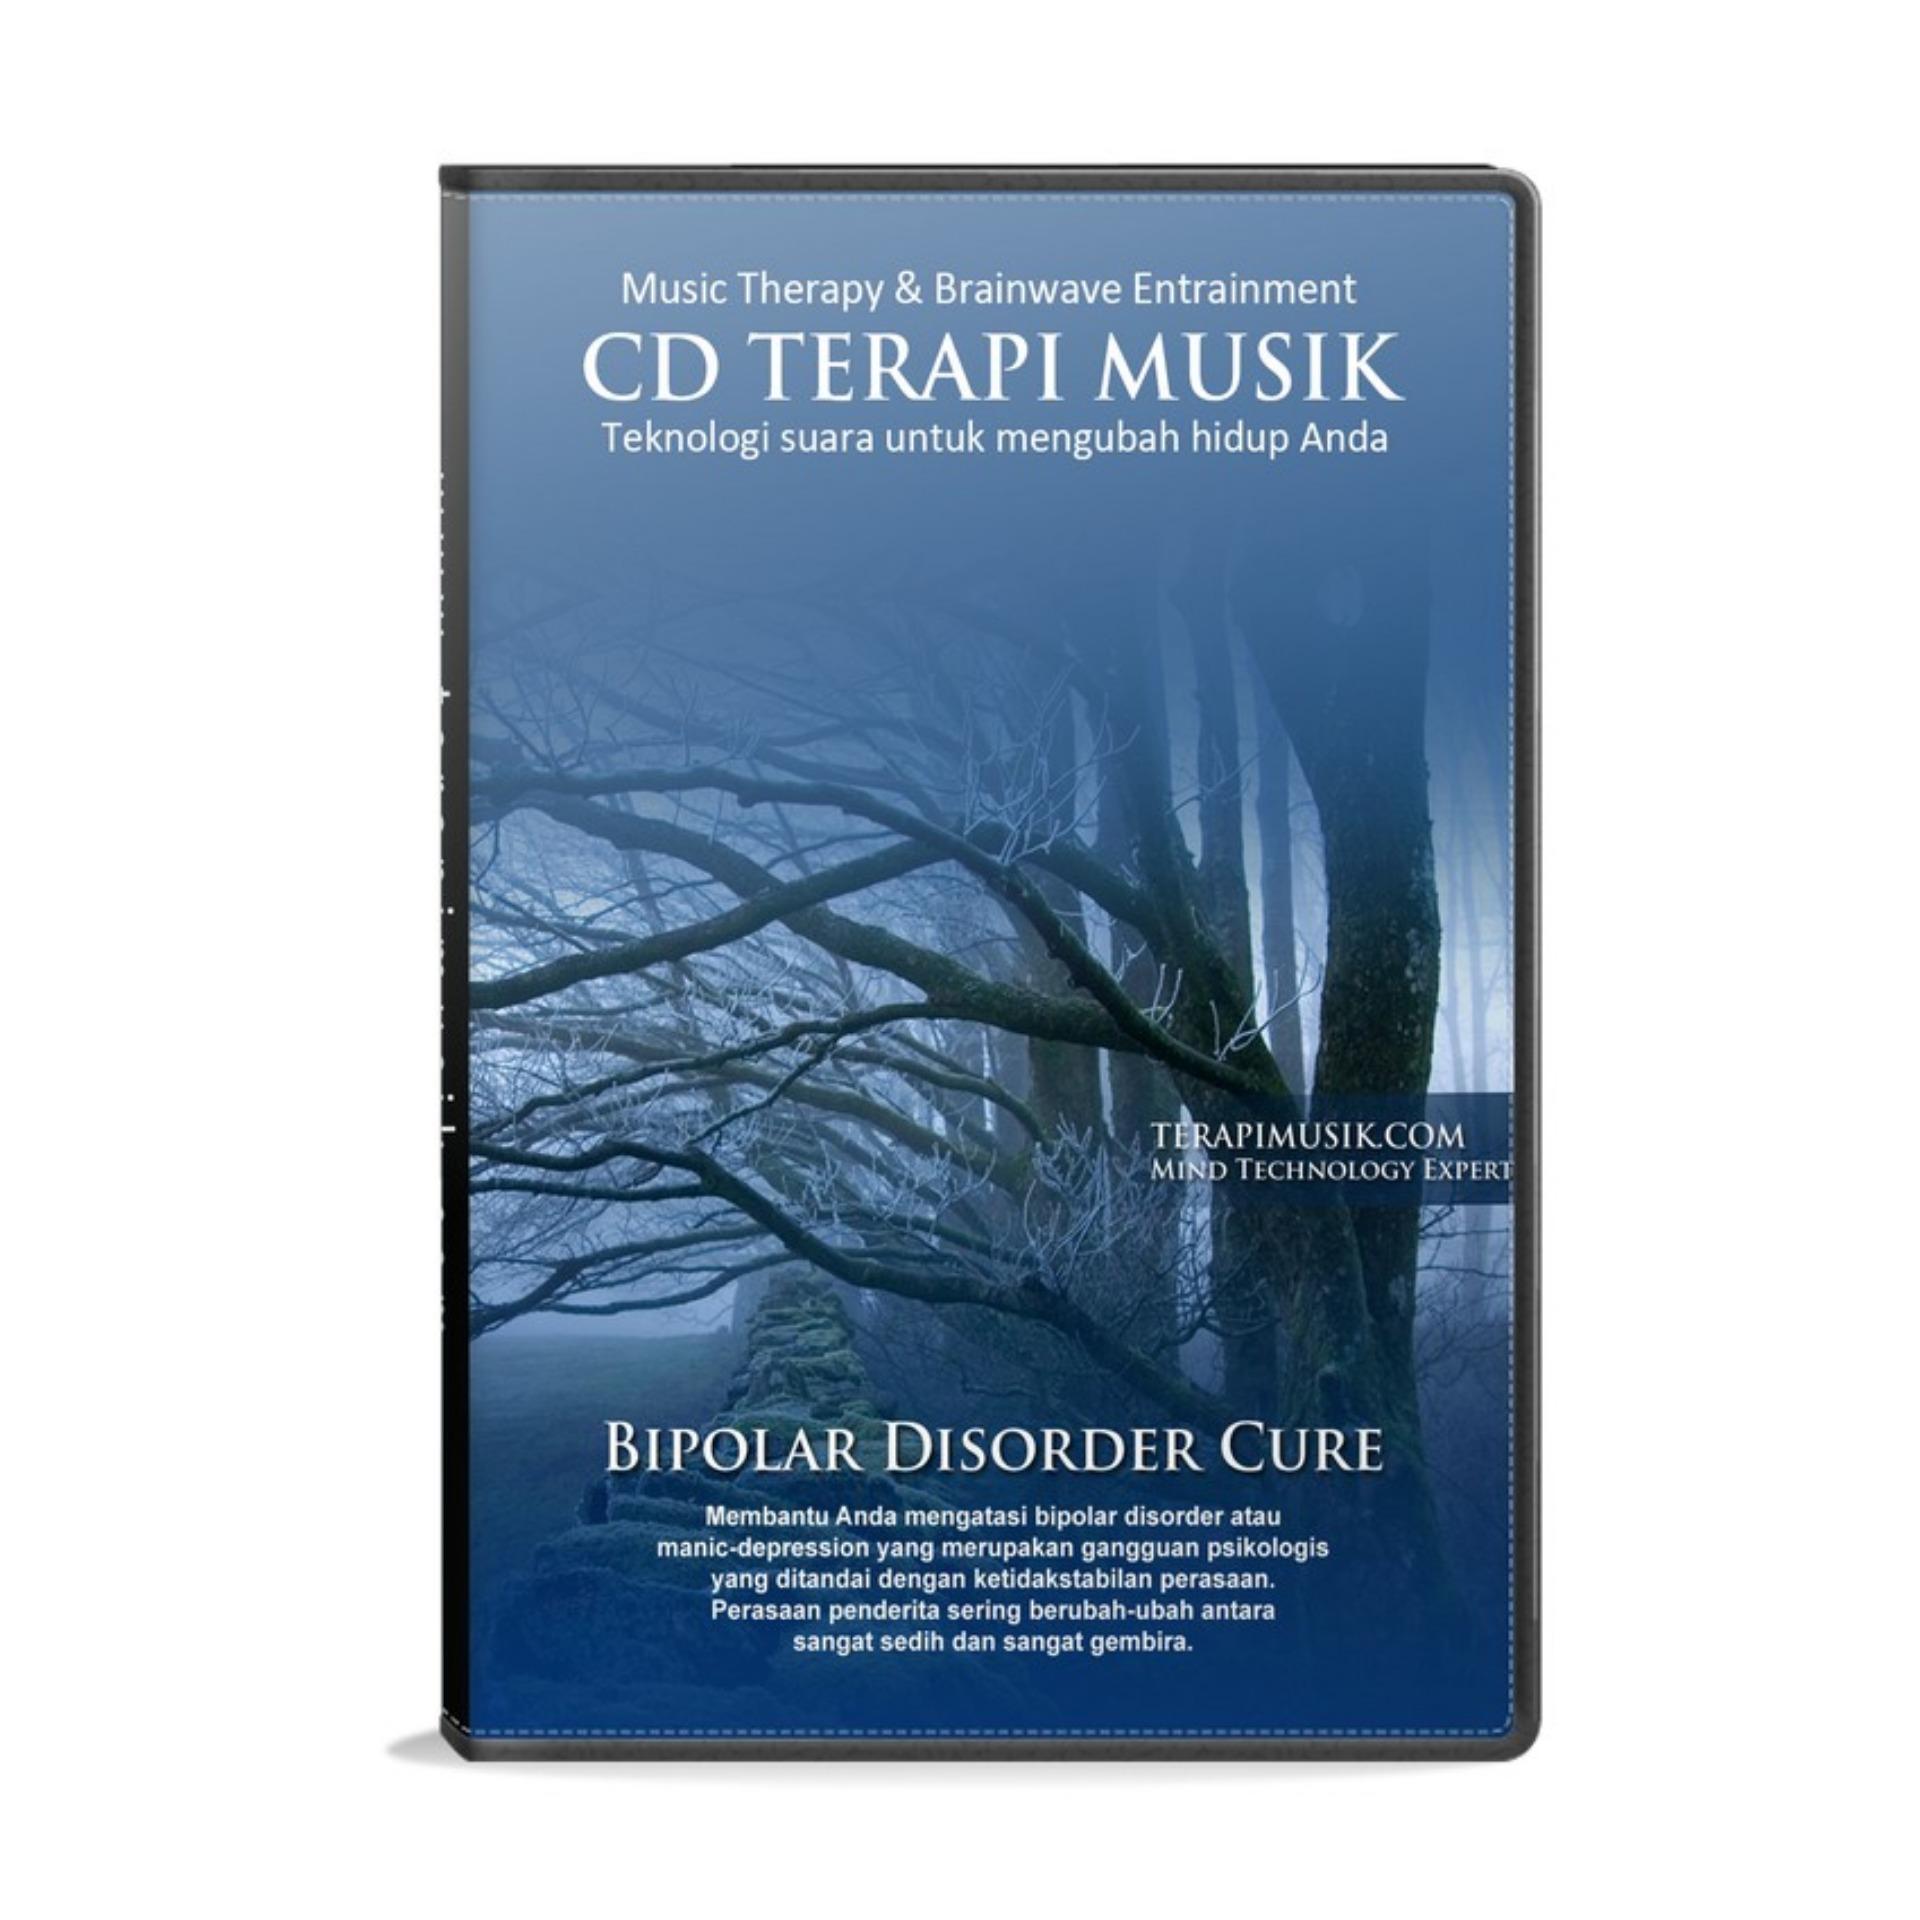 Terapi Musik Bipolar Disorder Cure (untuk Bipolar Disorder) By Terapi Musik.